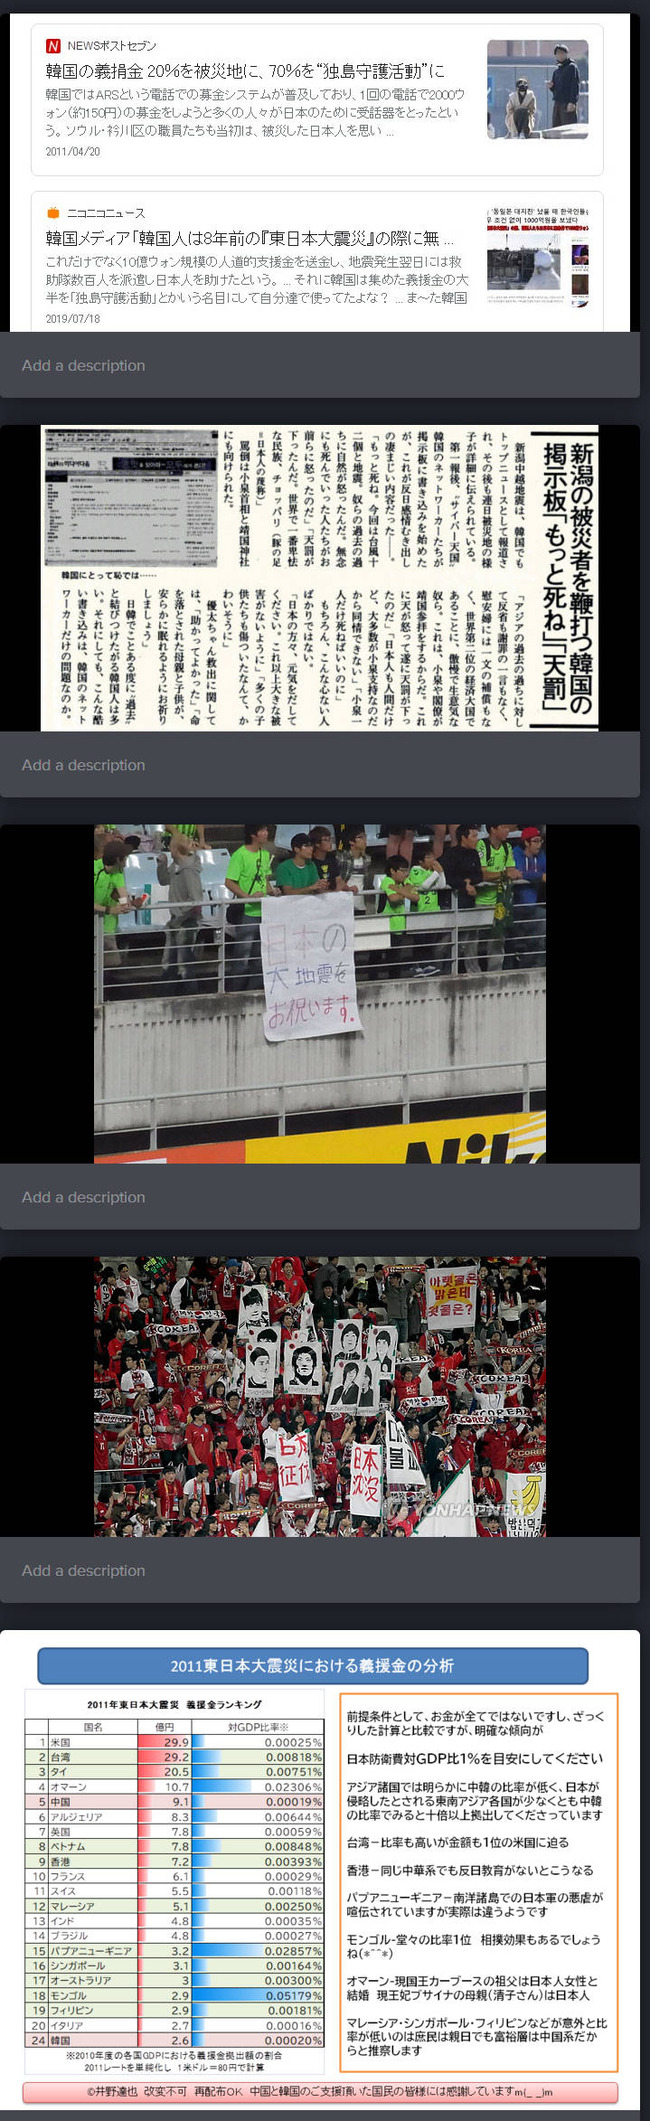 韓国 東日本大震災 捏造 歴史修正に関連した画像-05